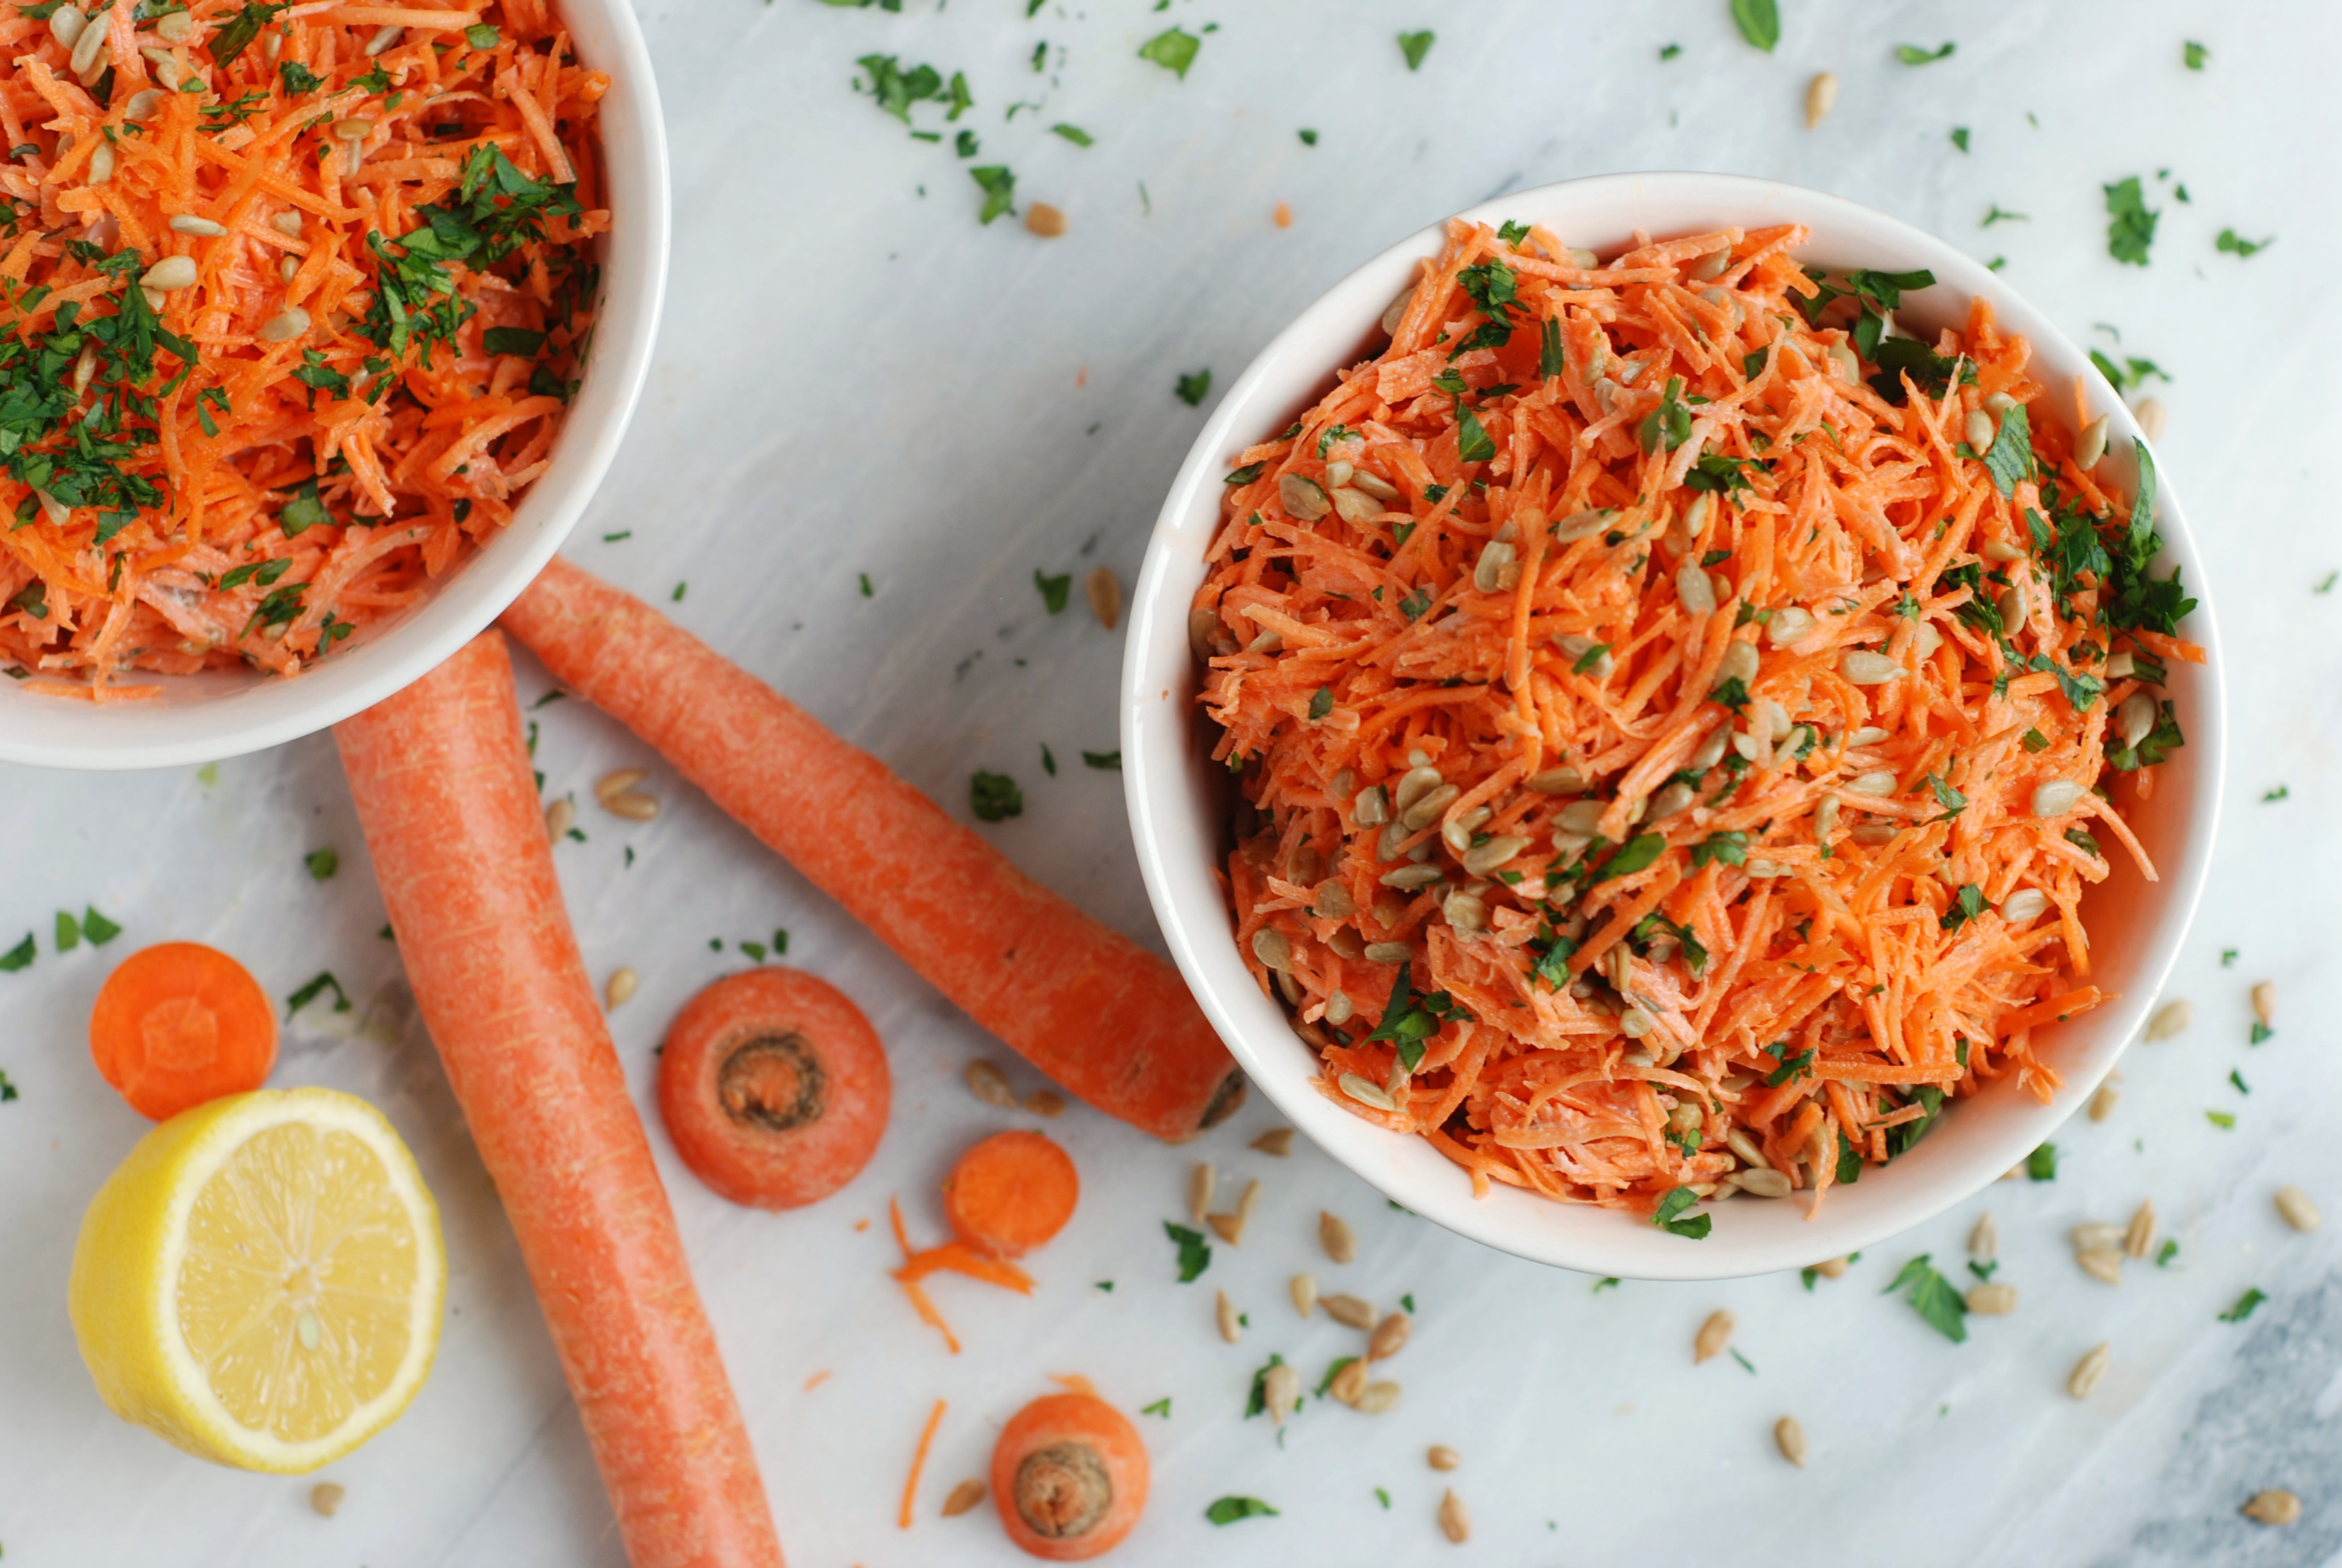 Салат из вареной моркови рецепт с фото пошагово - 1000.menu